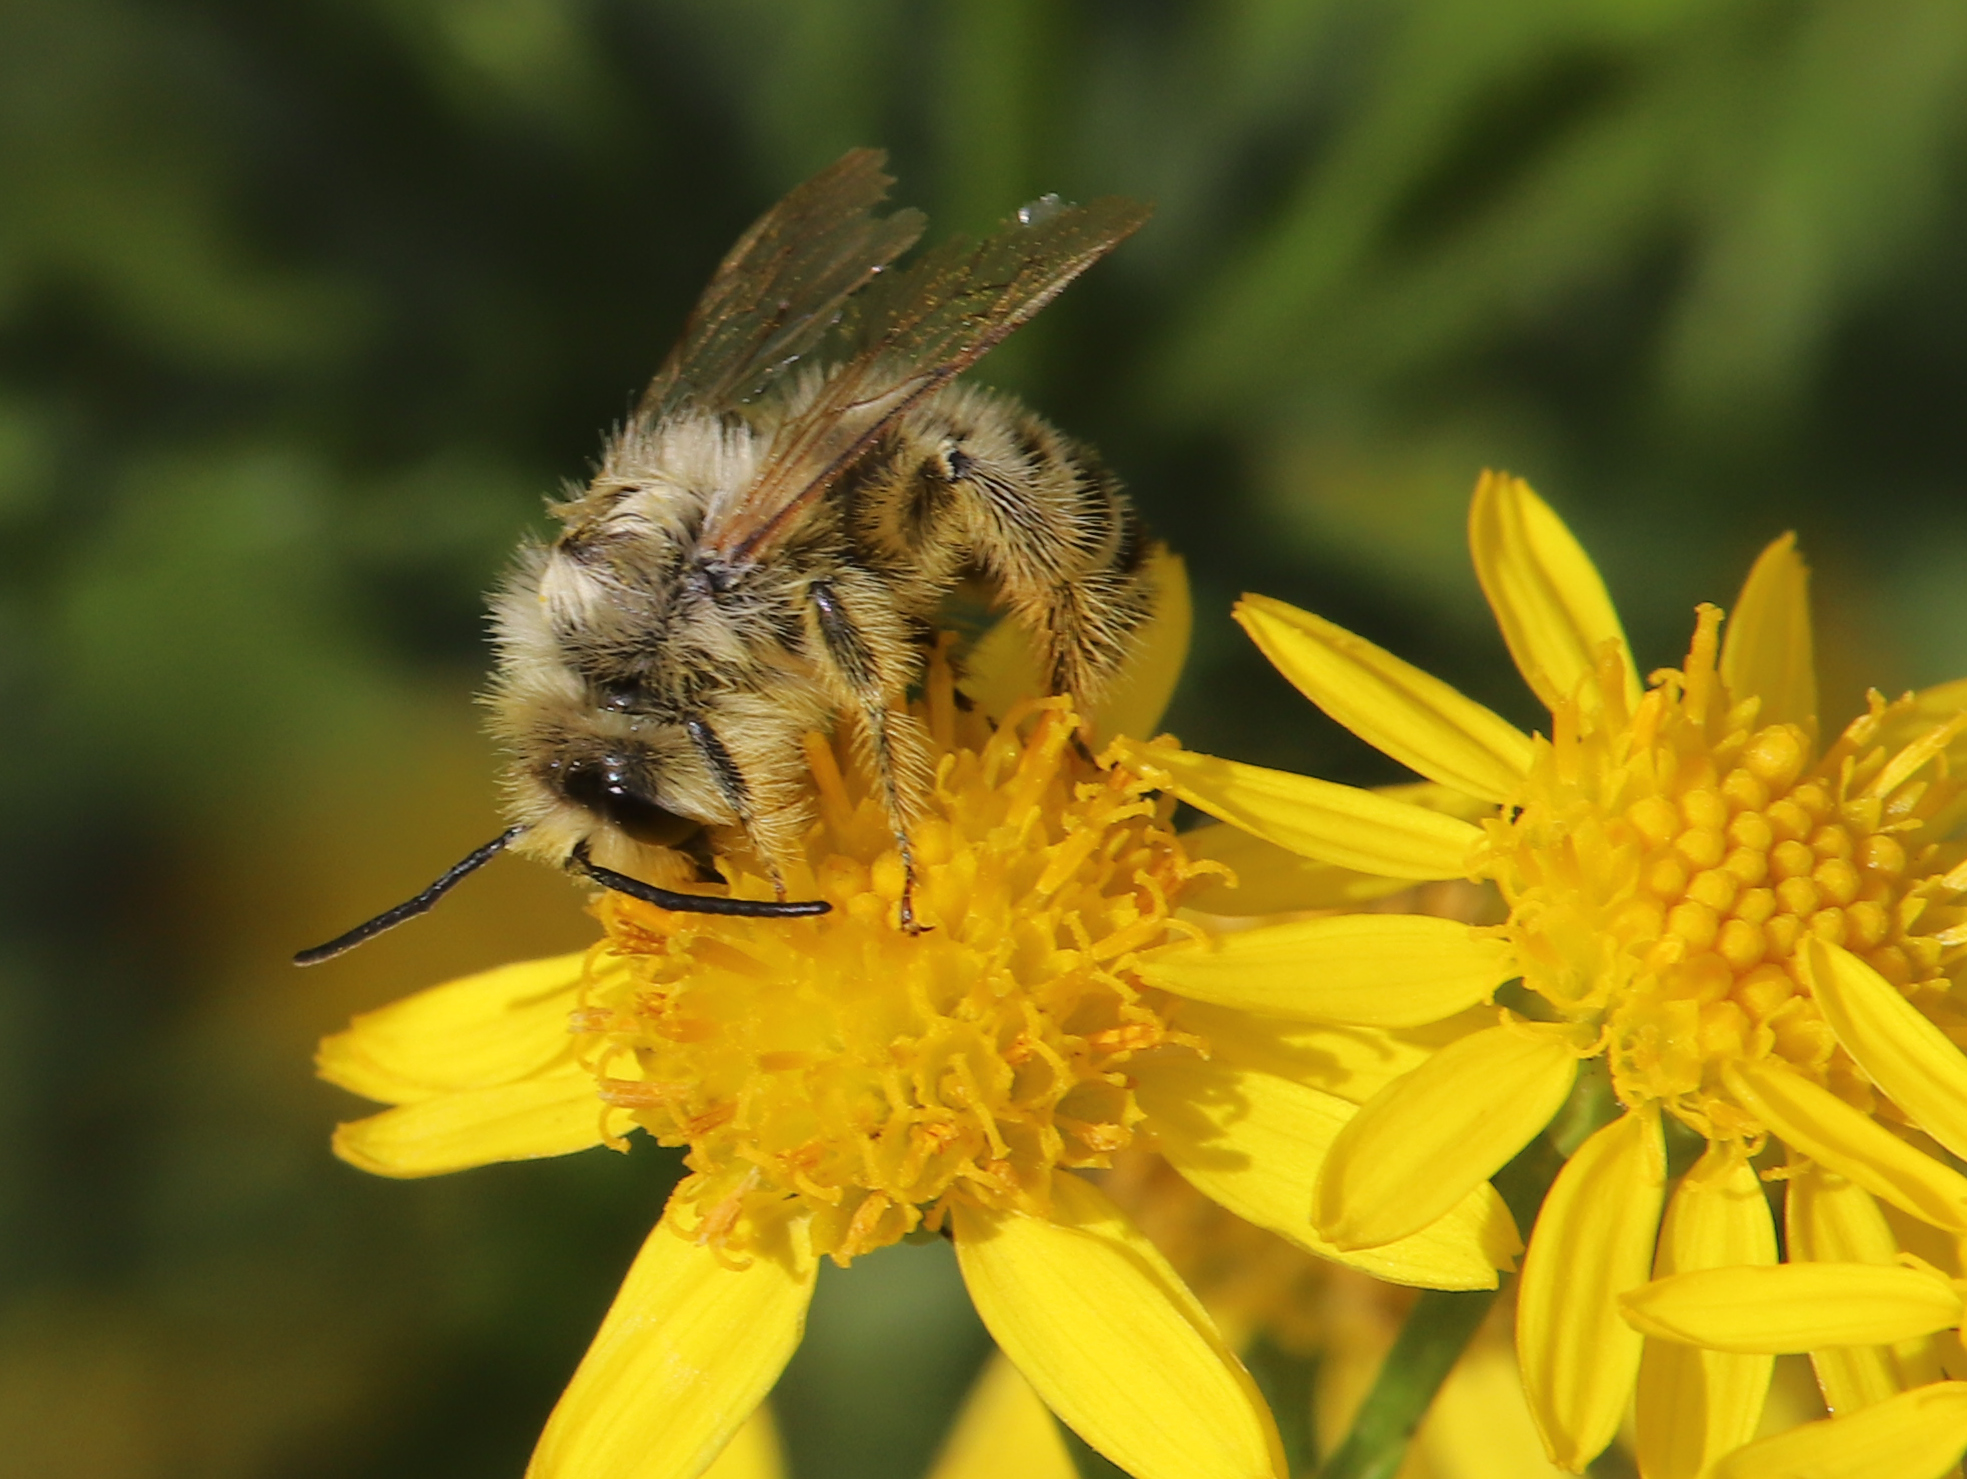 Foto: Friedhelm Hopmann; Raufüßige Hosenbiene